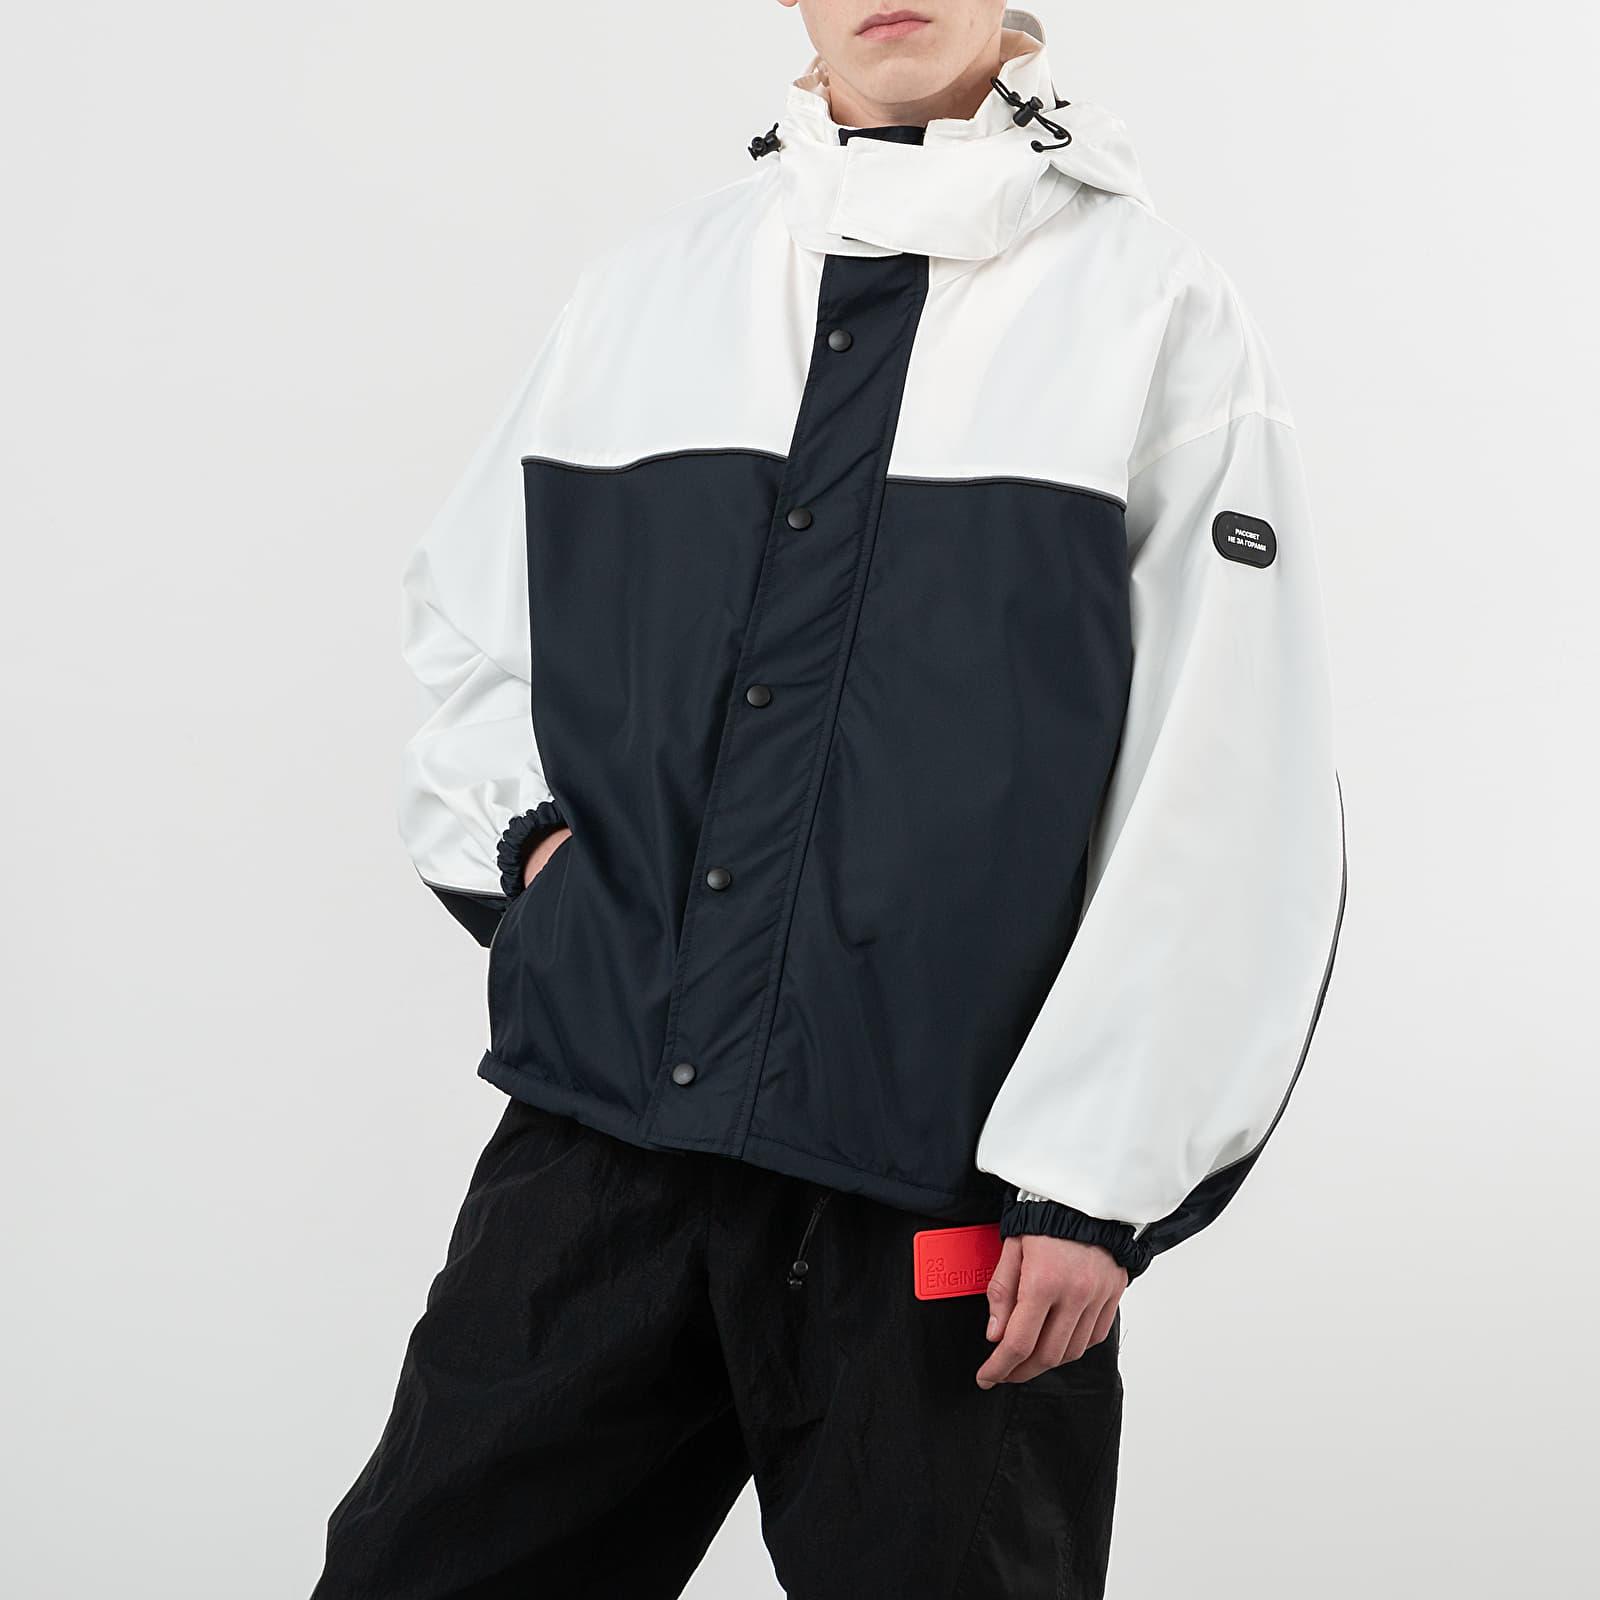 Vestes PACCBET Anorak Jacket Navy/ White